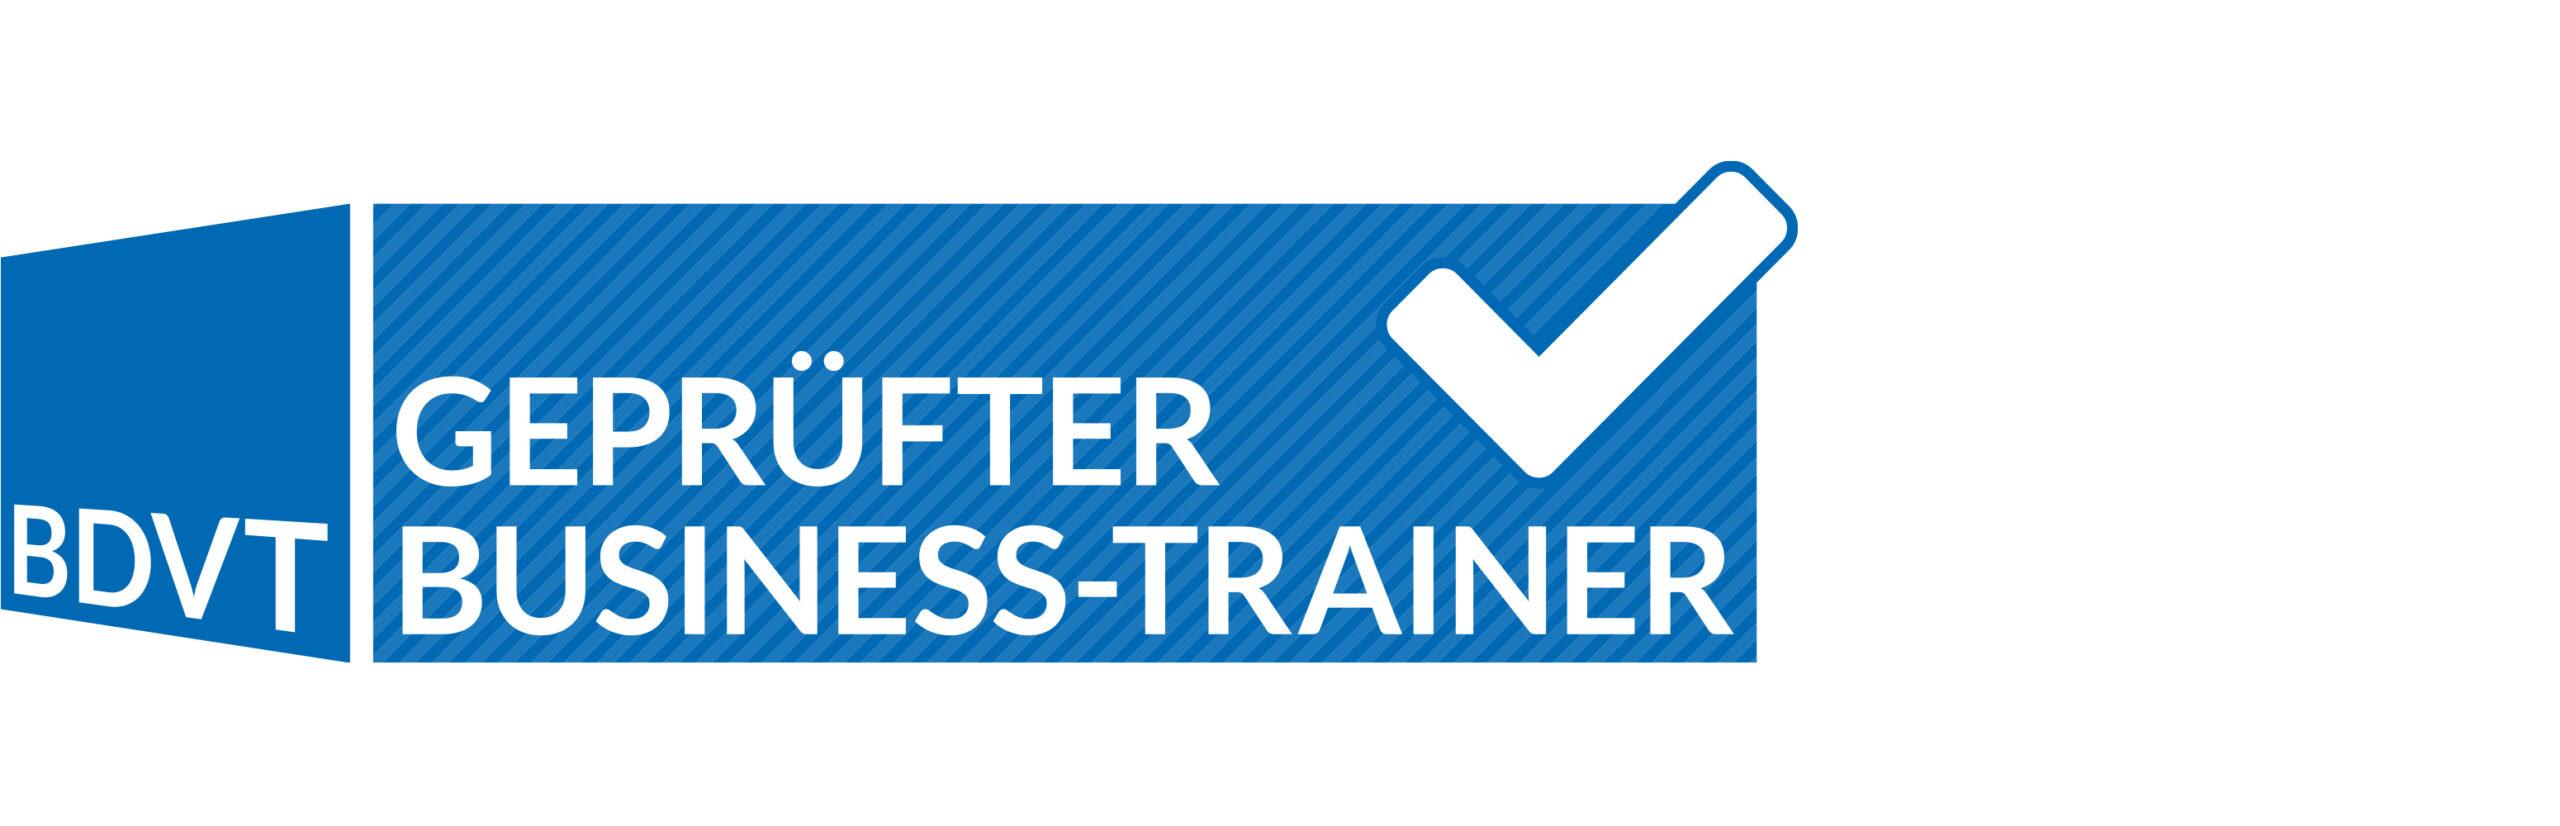 gepruefter-business-trainer